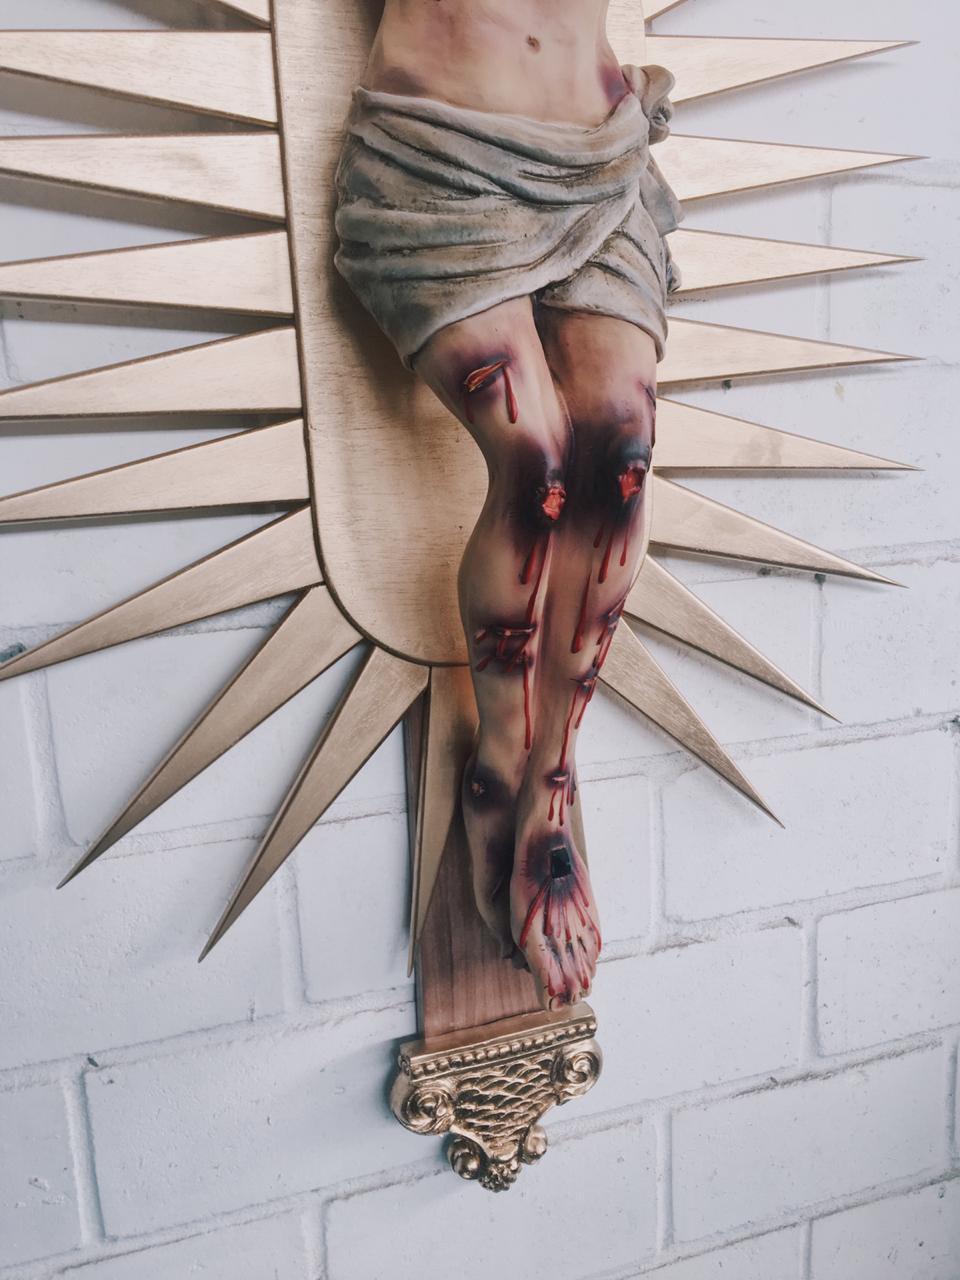 Crucifixo: 220 cm   Corpo: 140 cm (Bom Jesus   Agonia de Cristo)